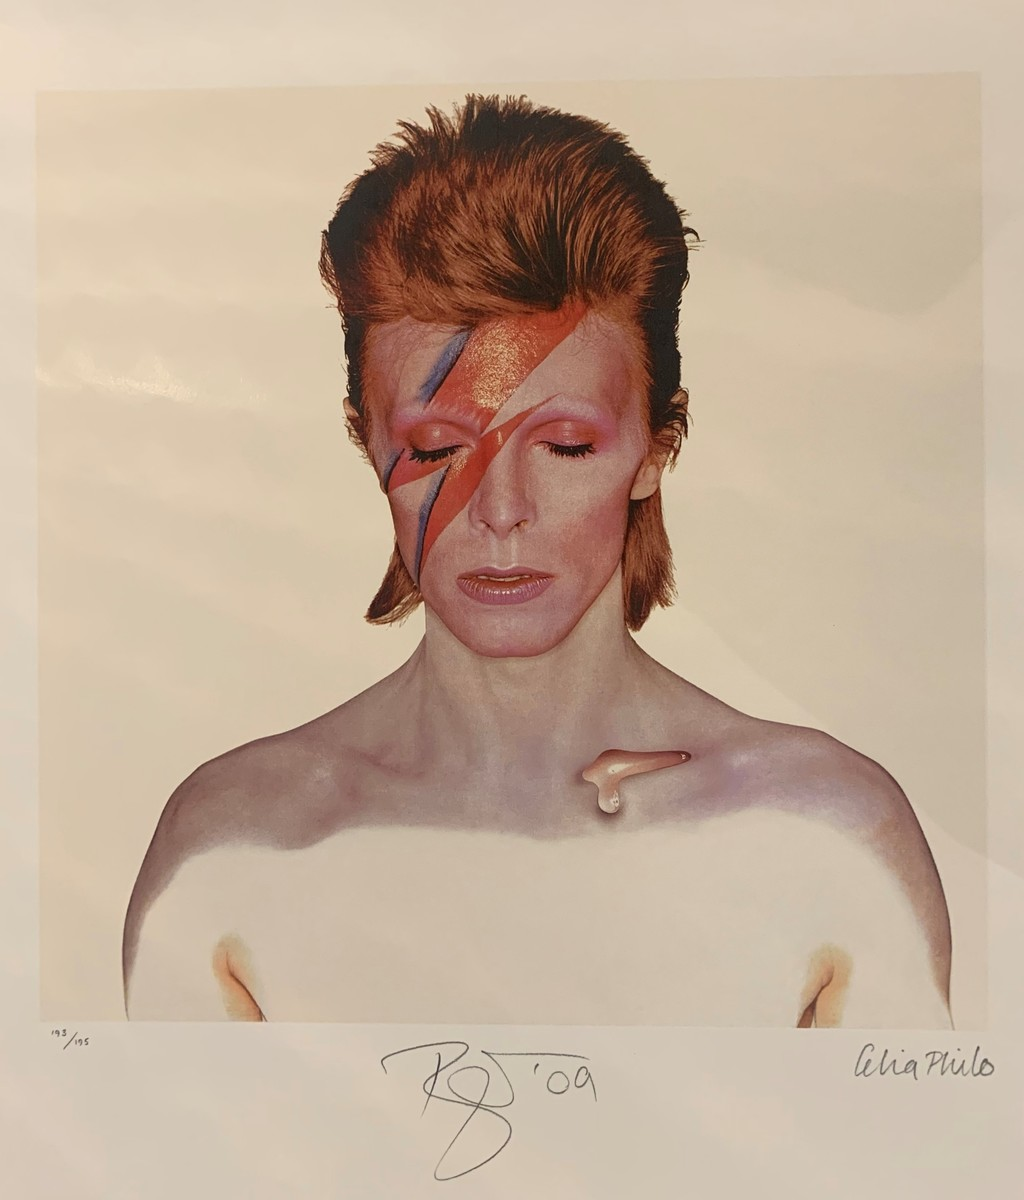 David Bowie - Aladdine Sane Limited Fine Art Print Signed by David Bowie & Celia Philo In Pencil